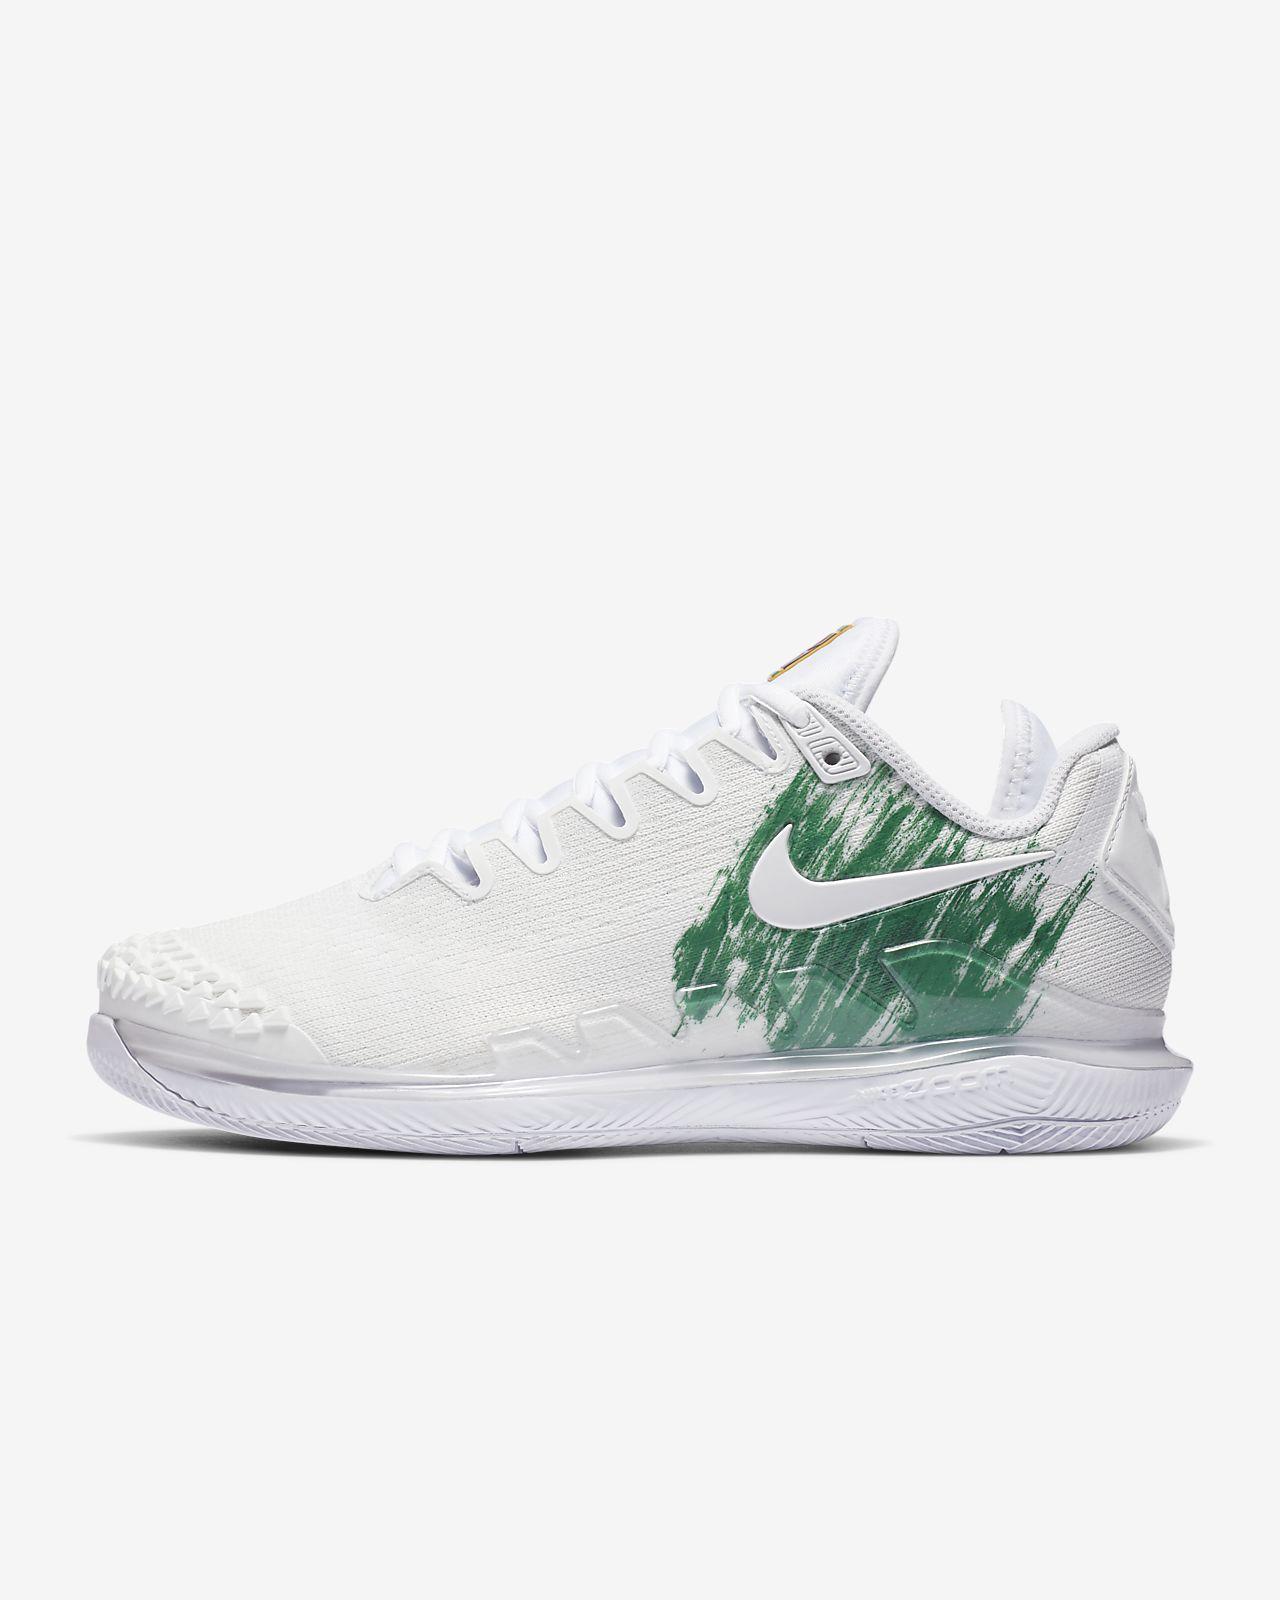 NikeCourt Air Zoom Vapor X Knit Women's Hard Court Tennis Shoe